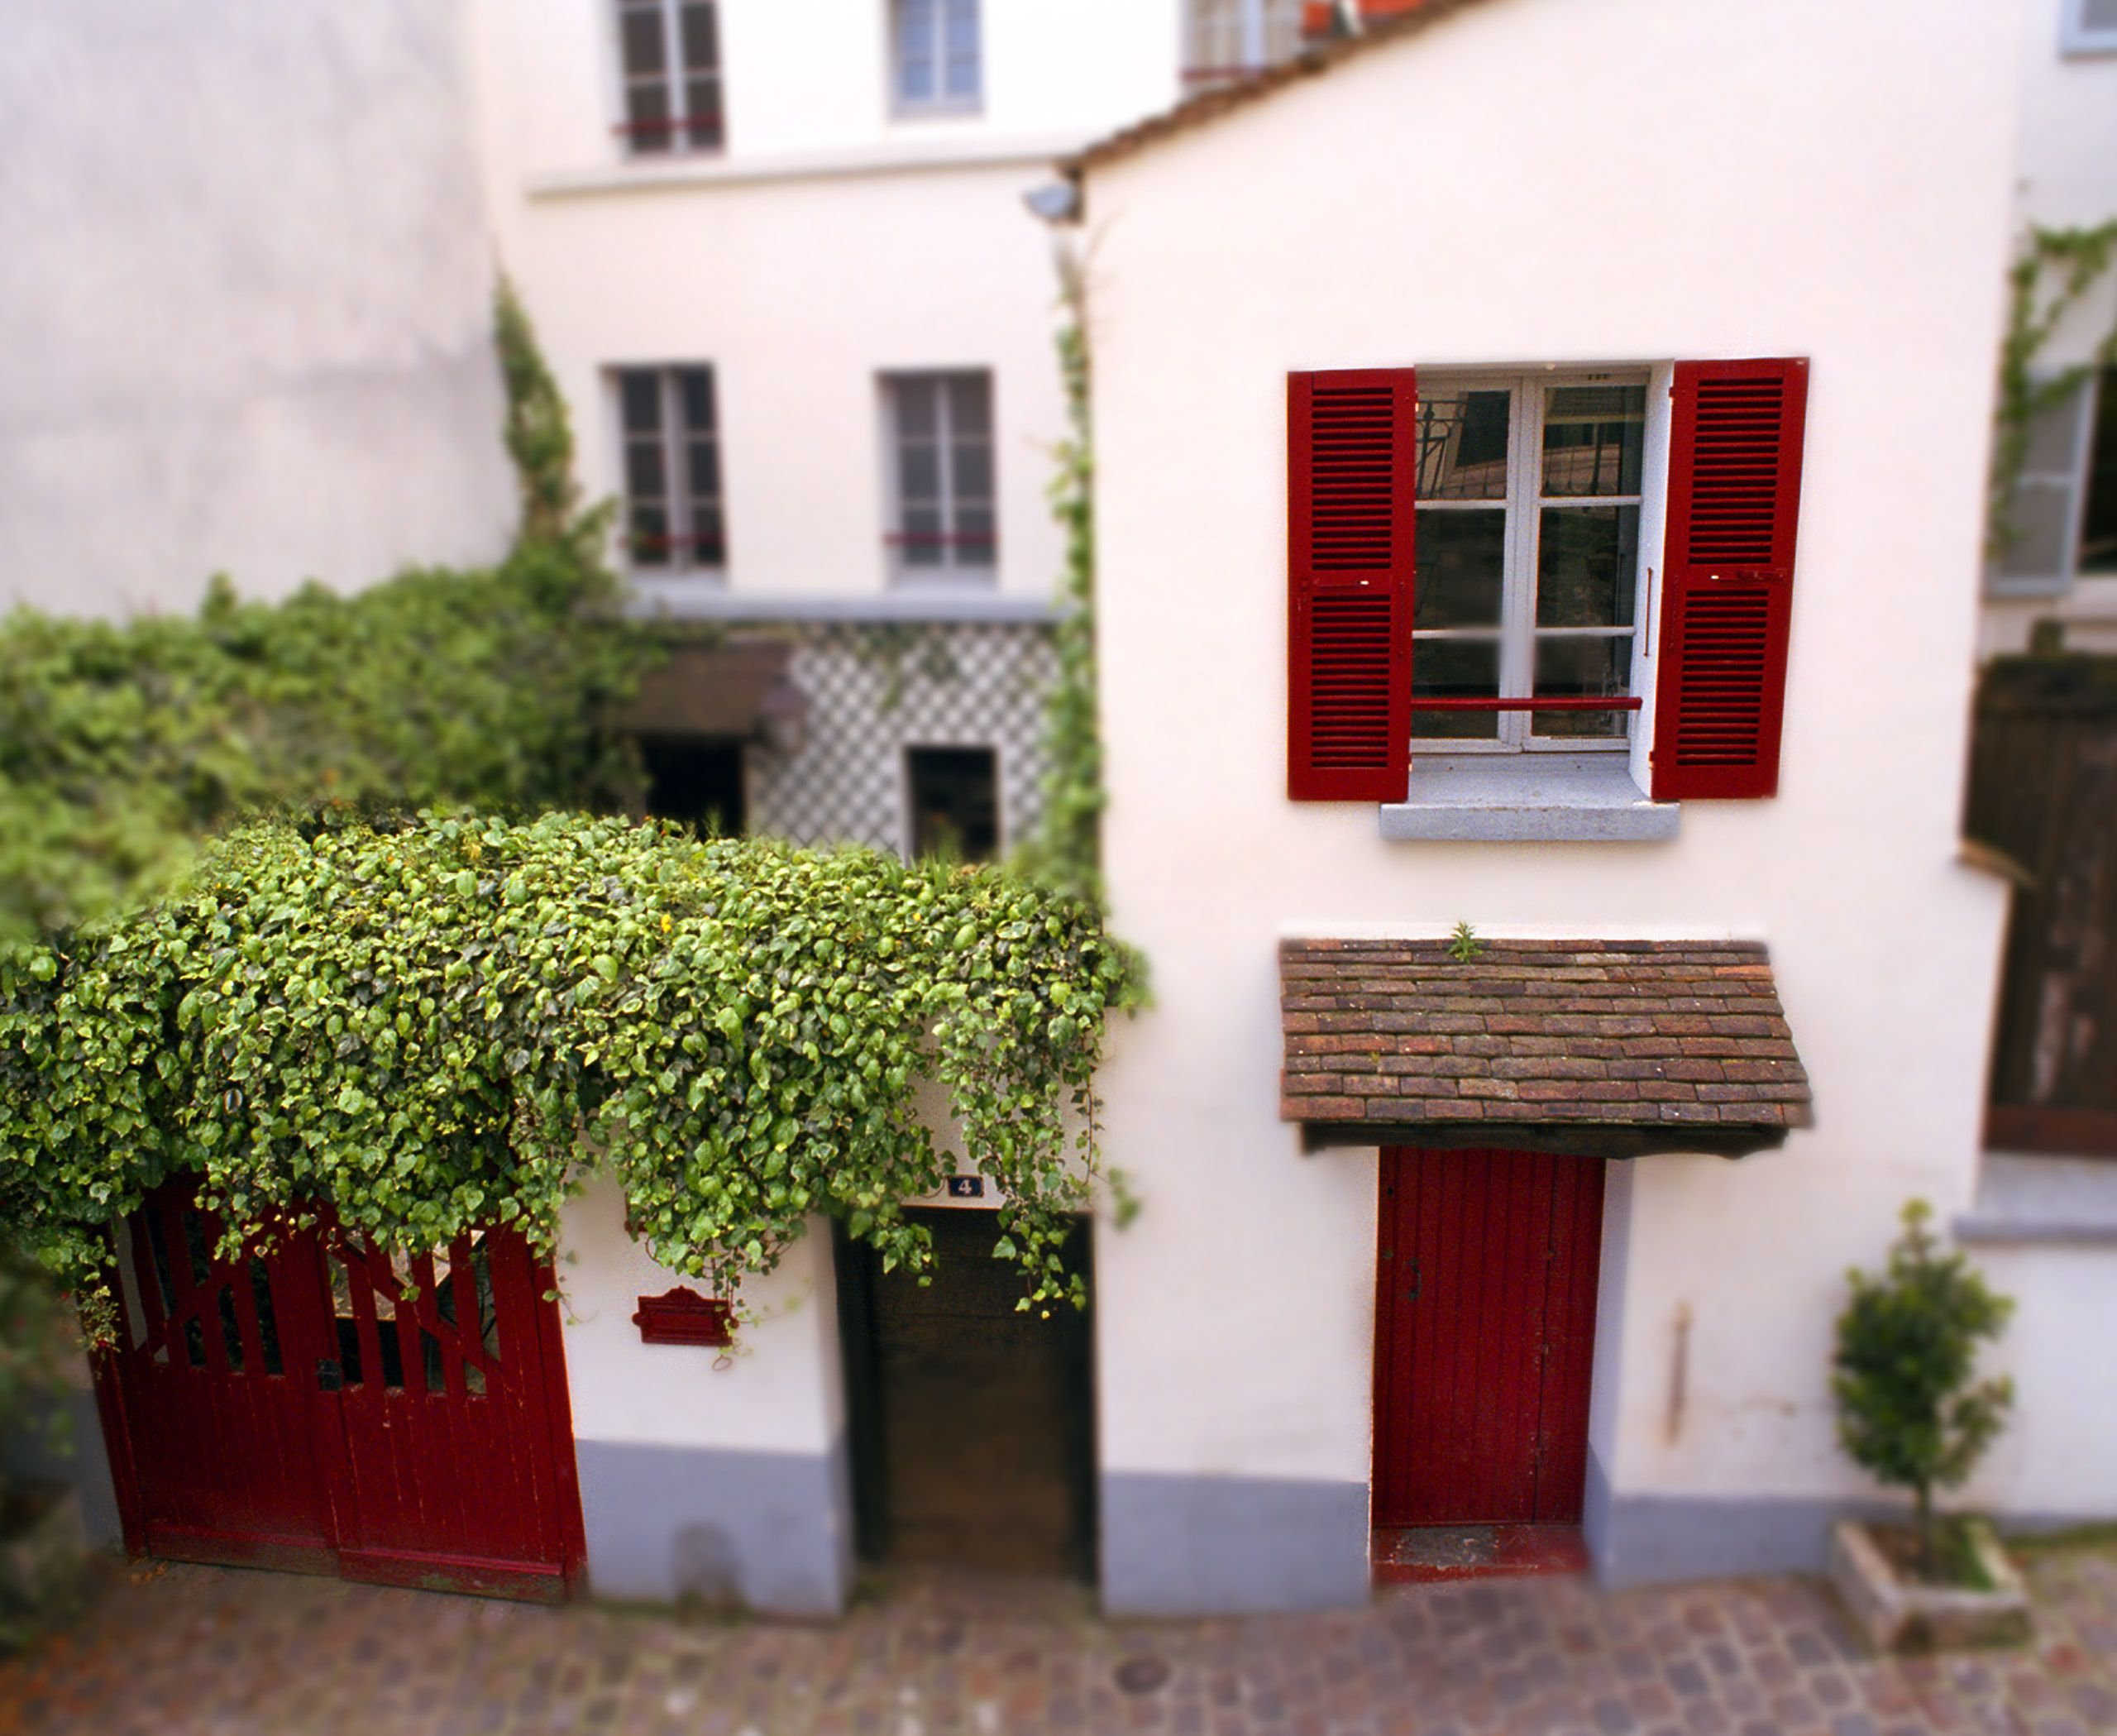 reddoor_house.jpg